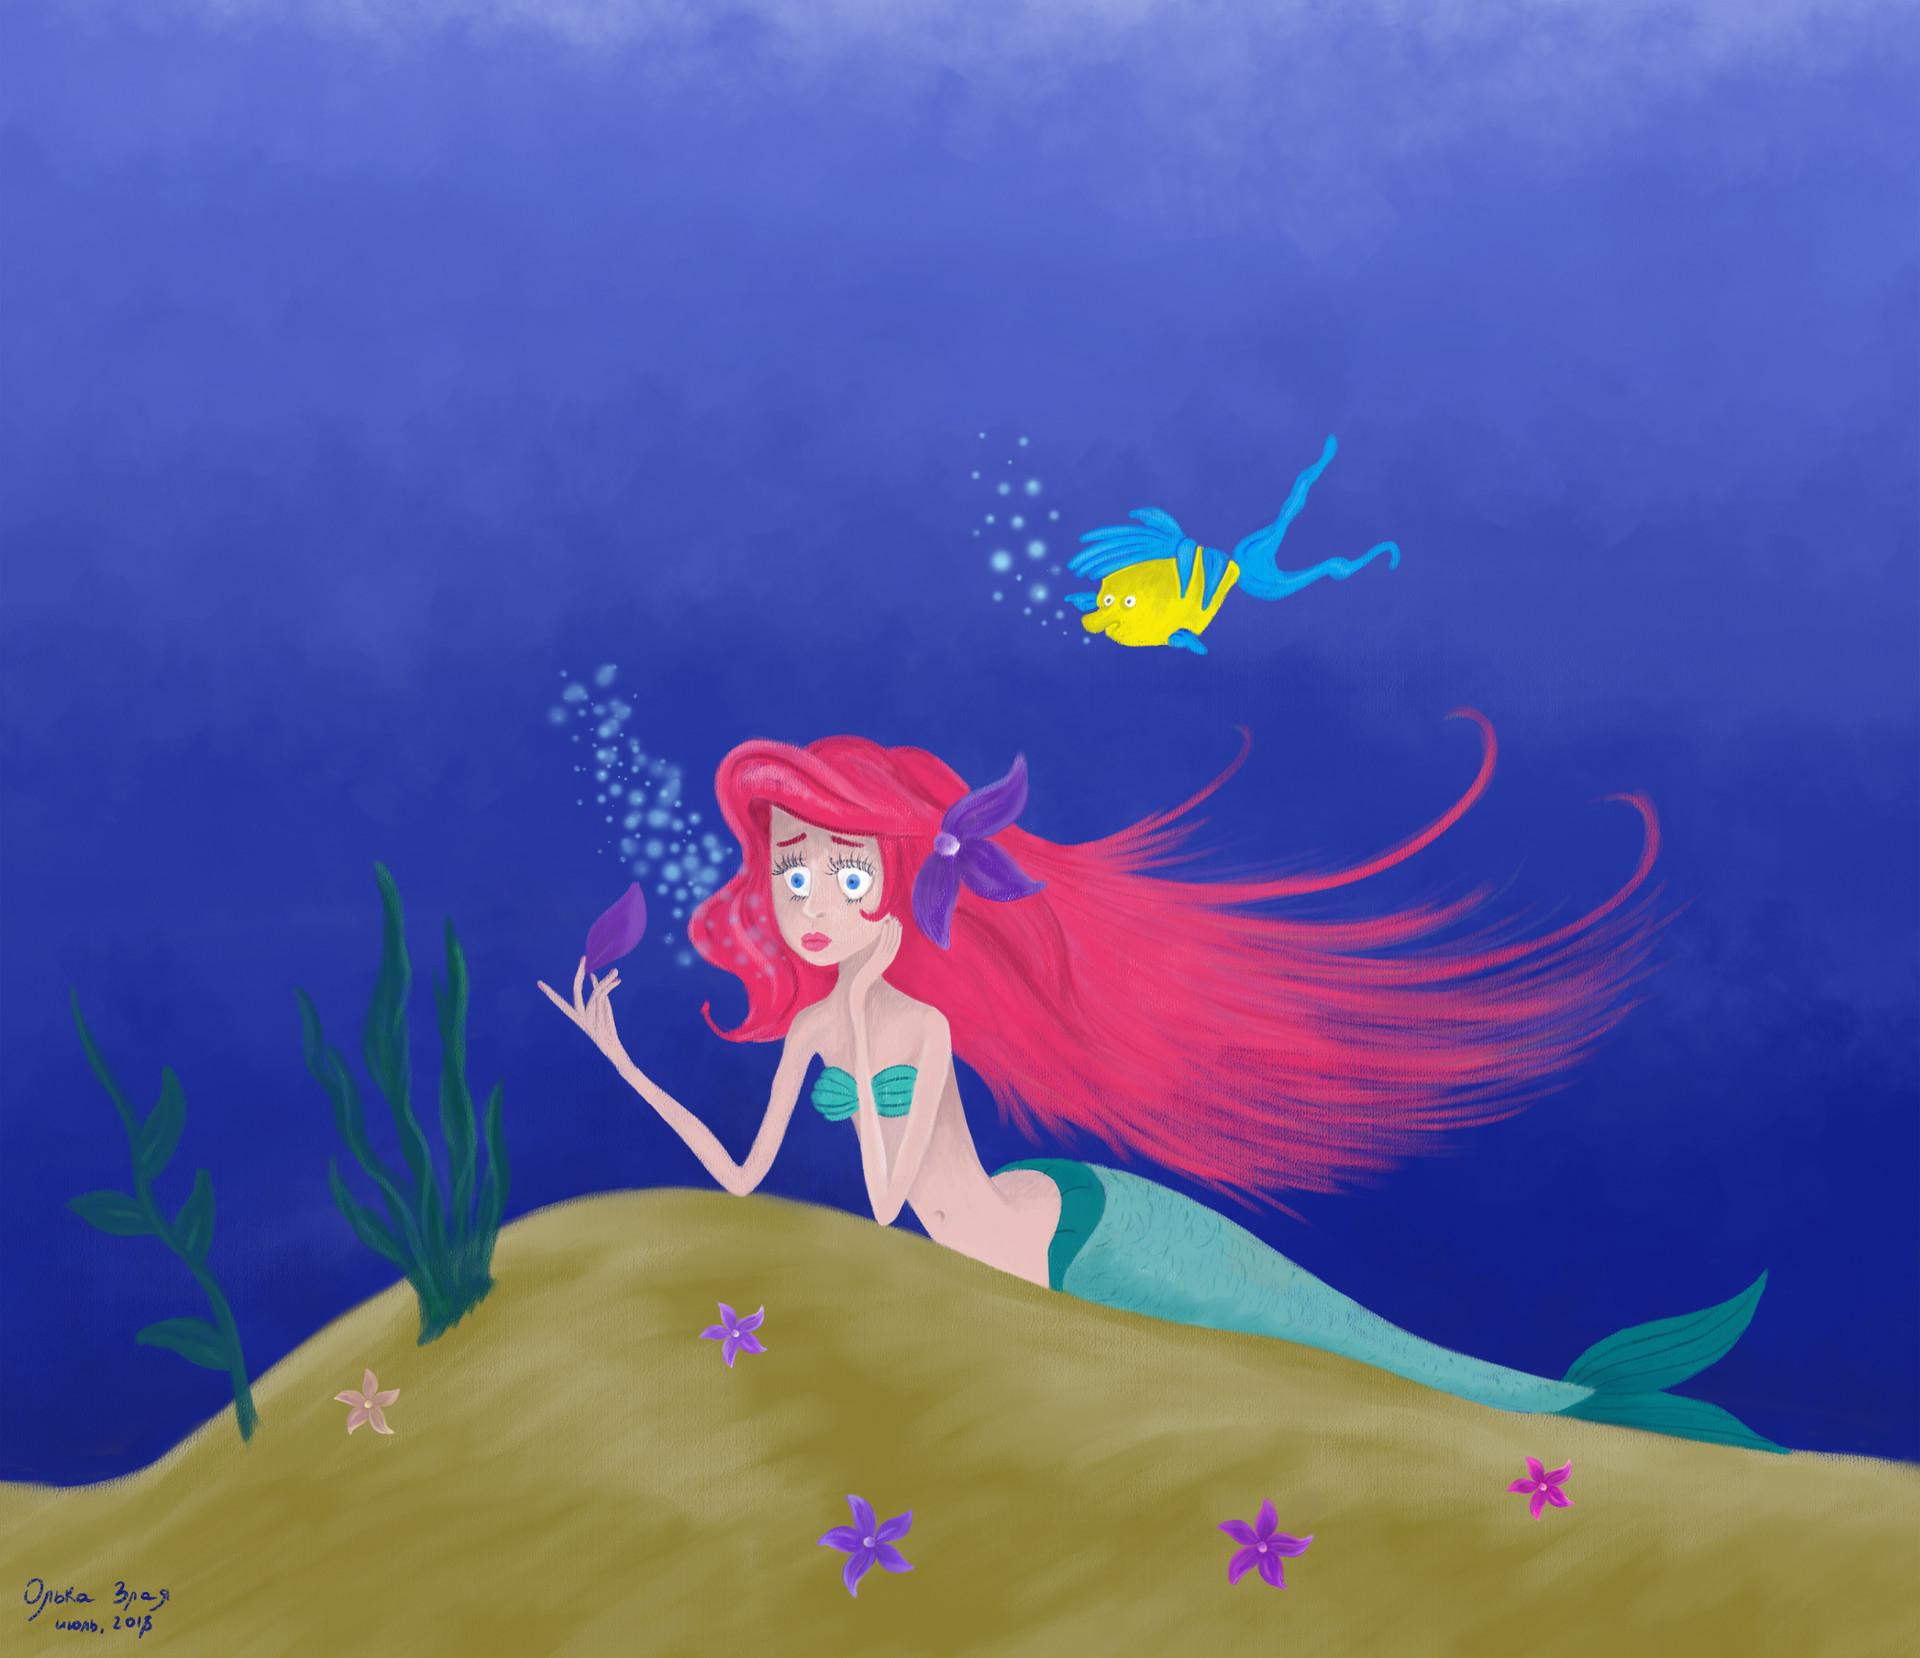 Mermaid vk работа моделью в чатах